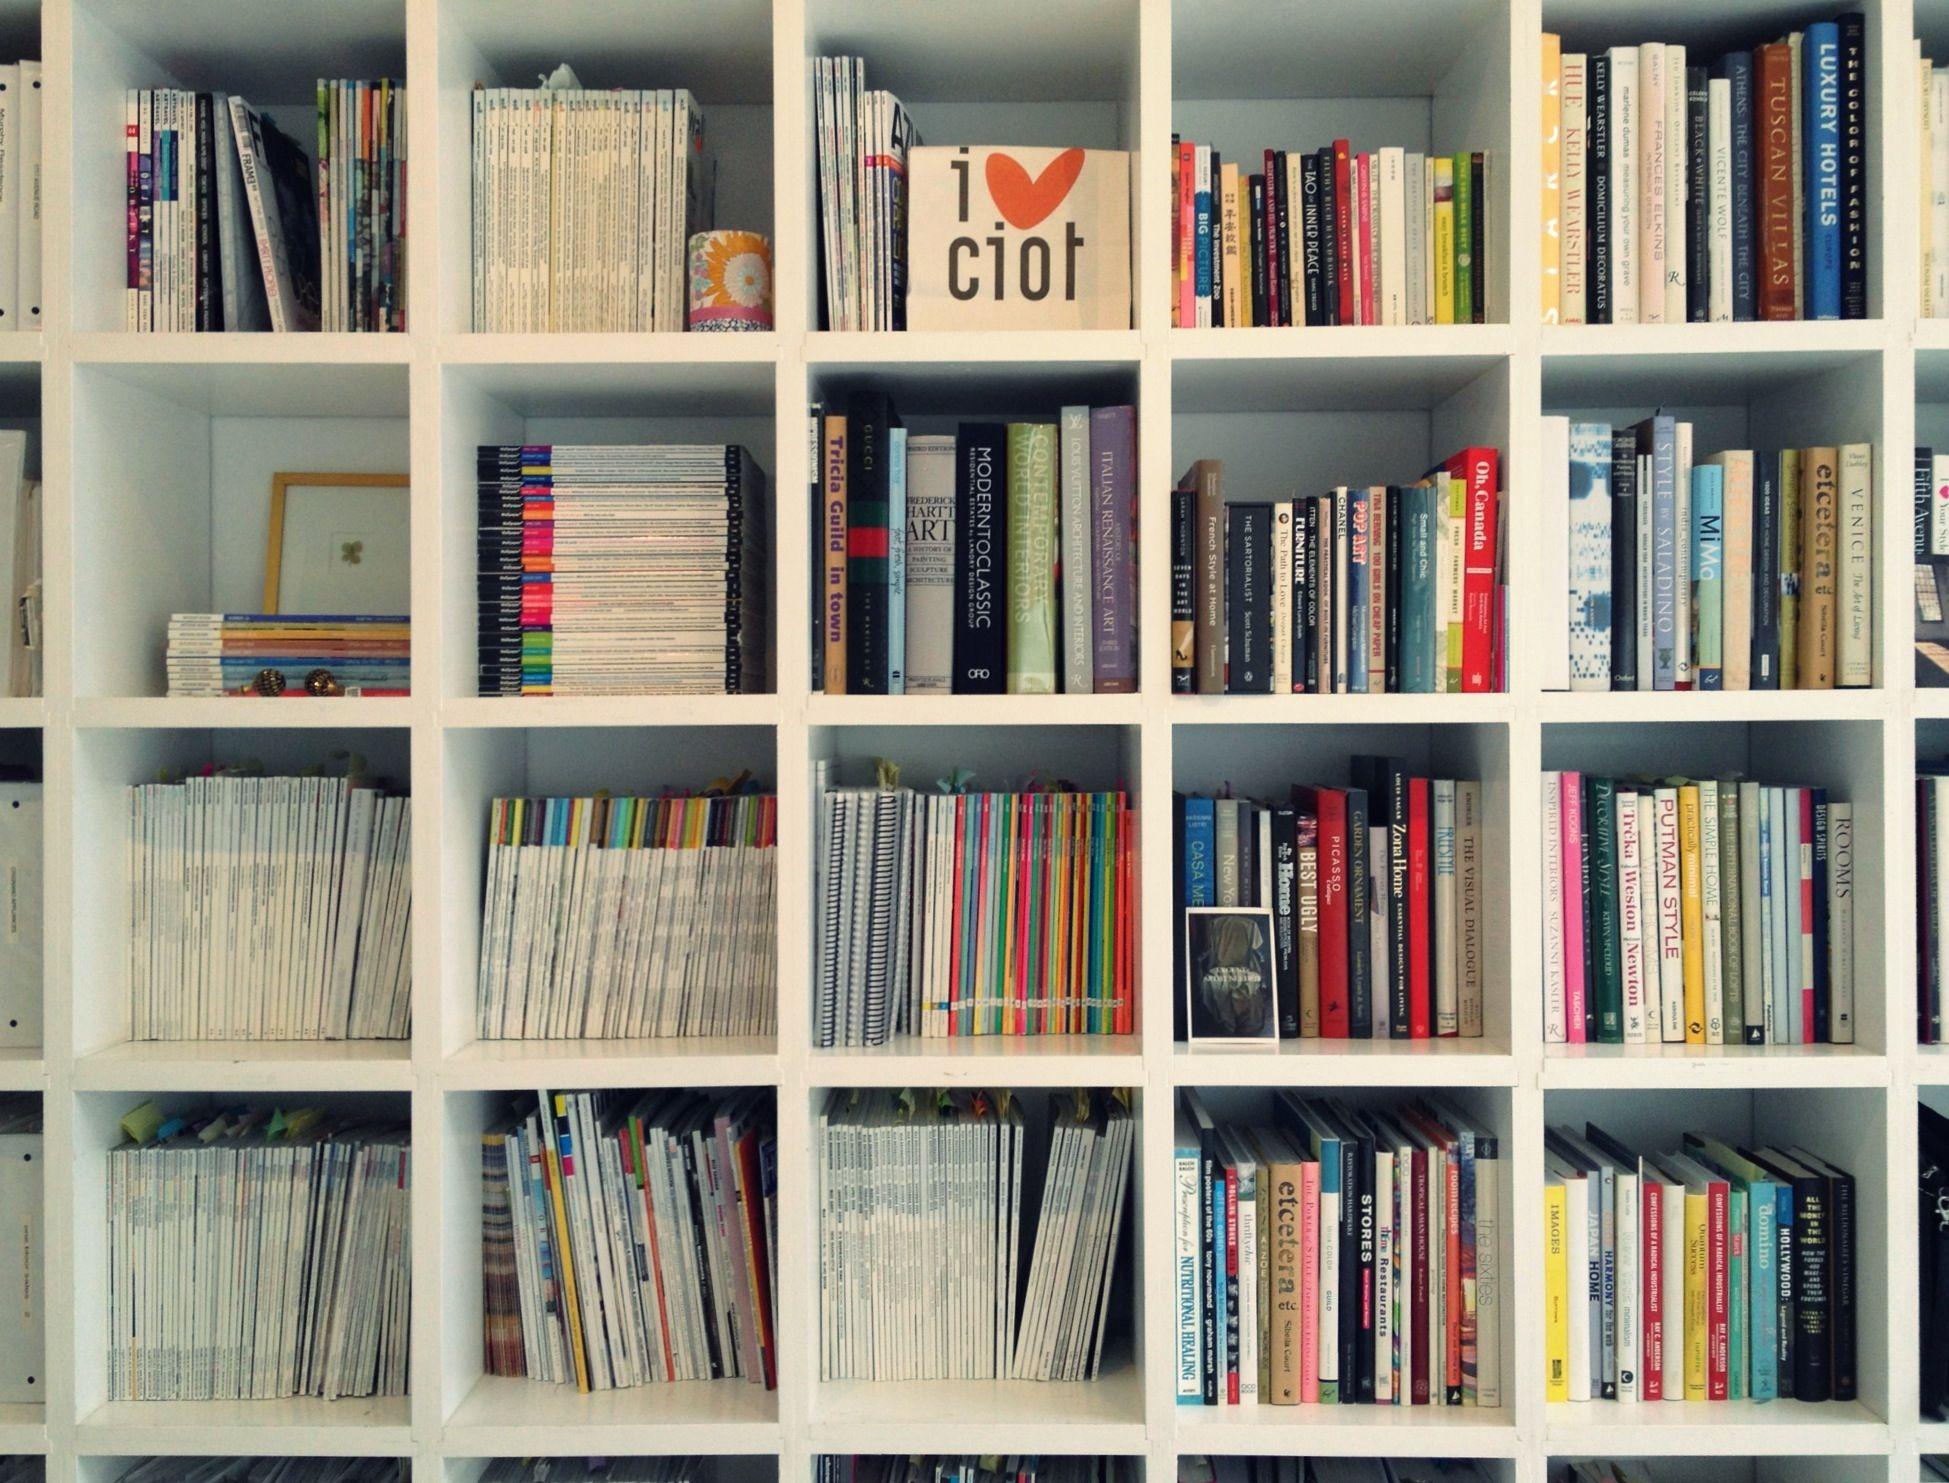 Great Bookshelf And Book Display.